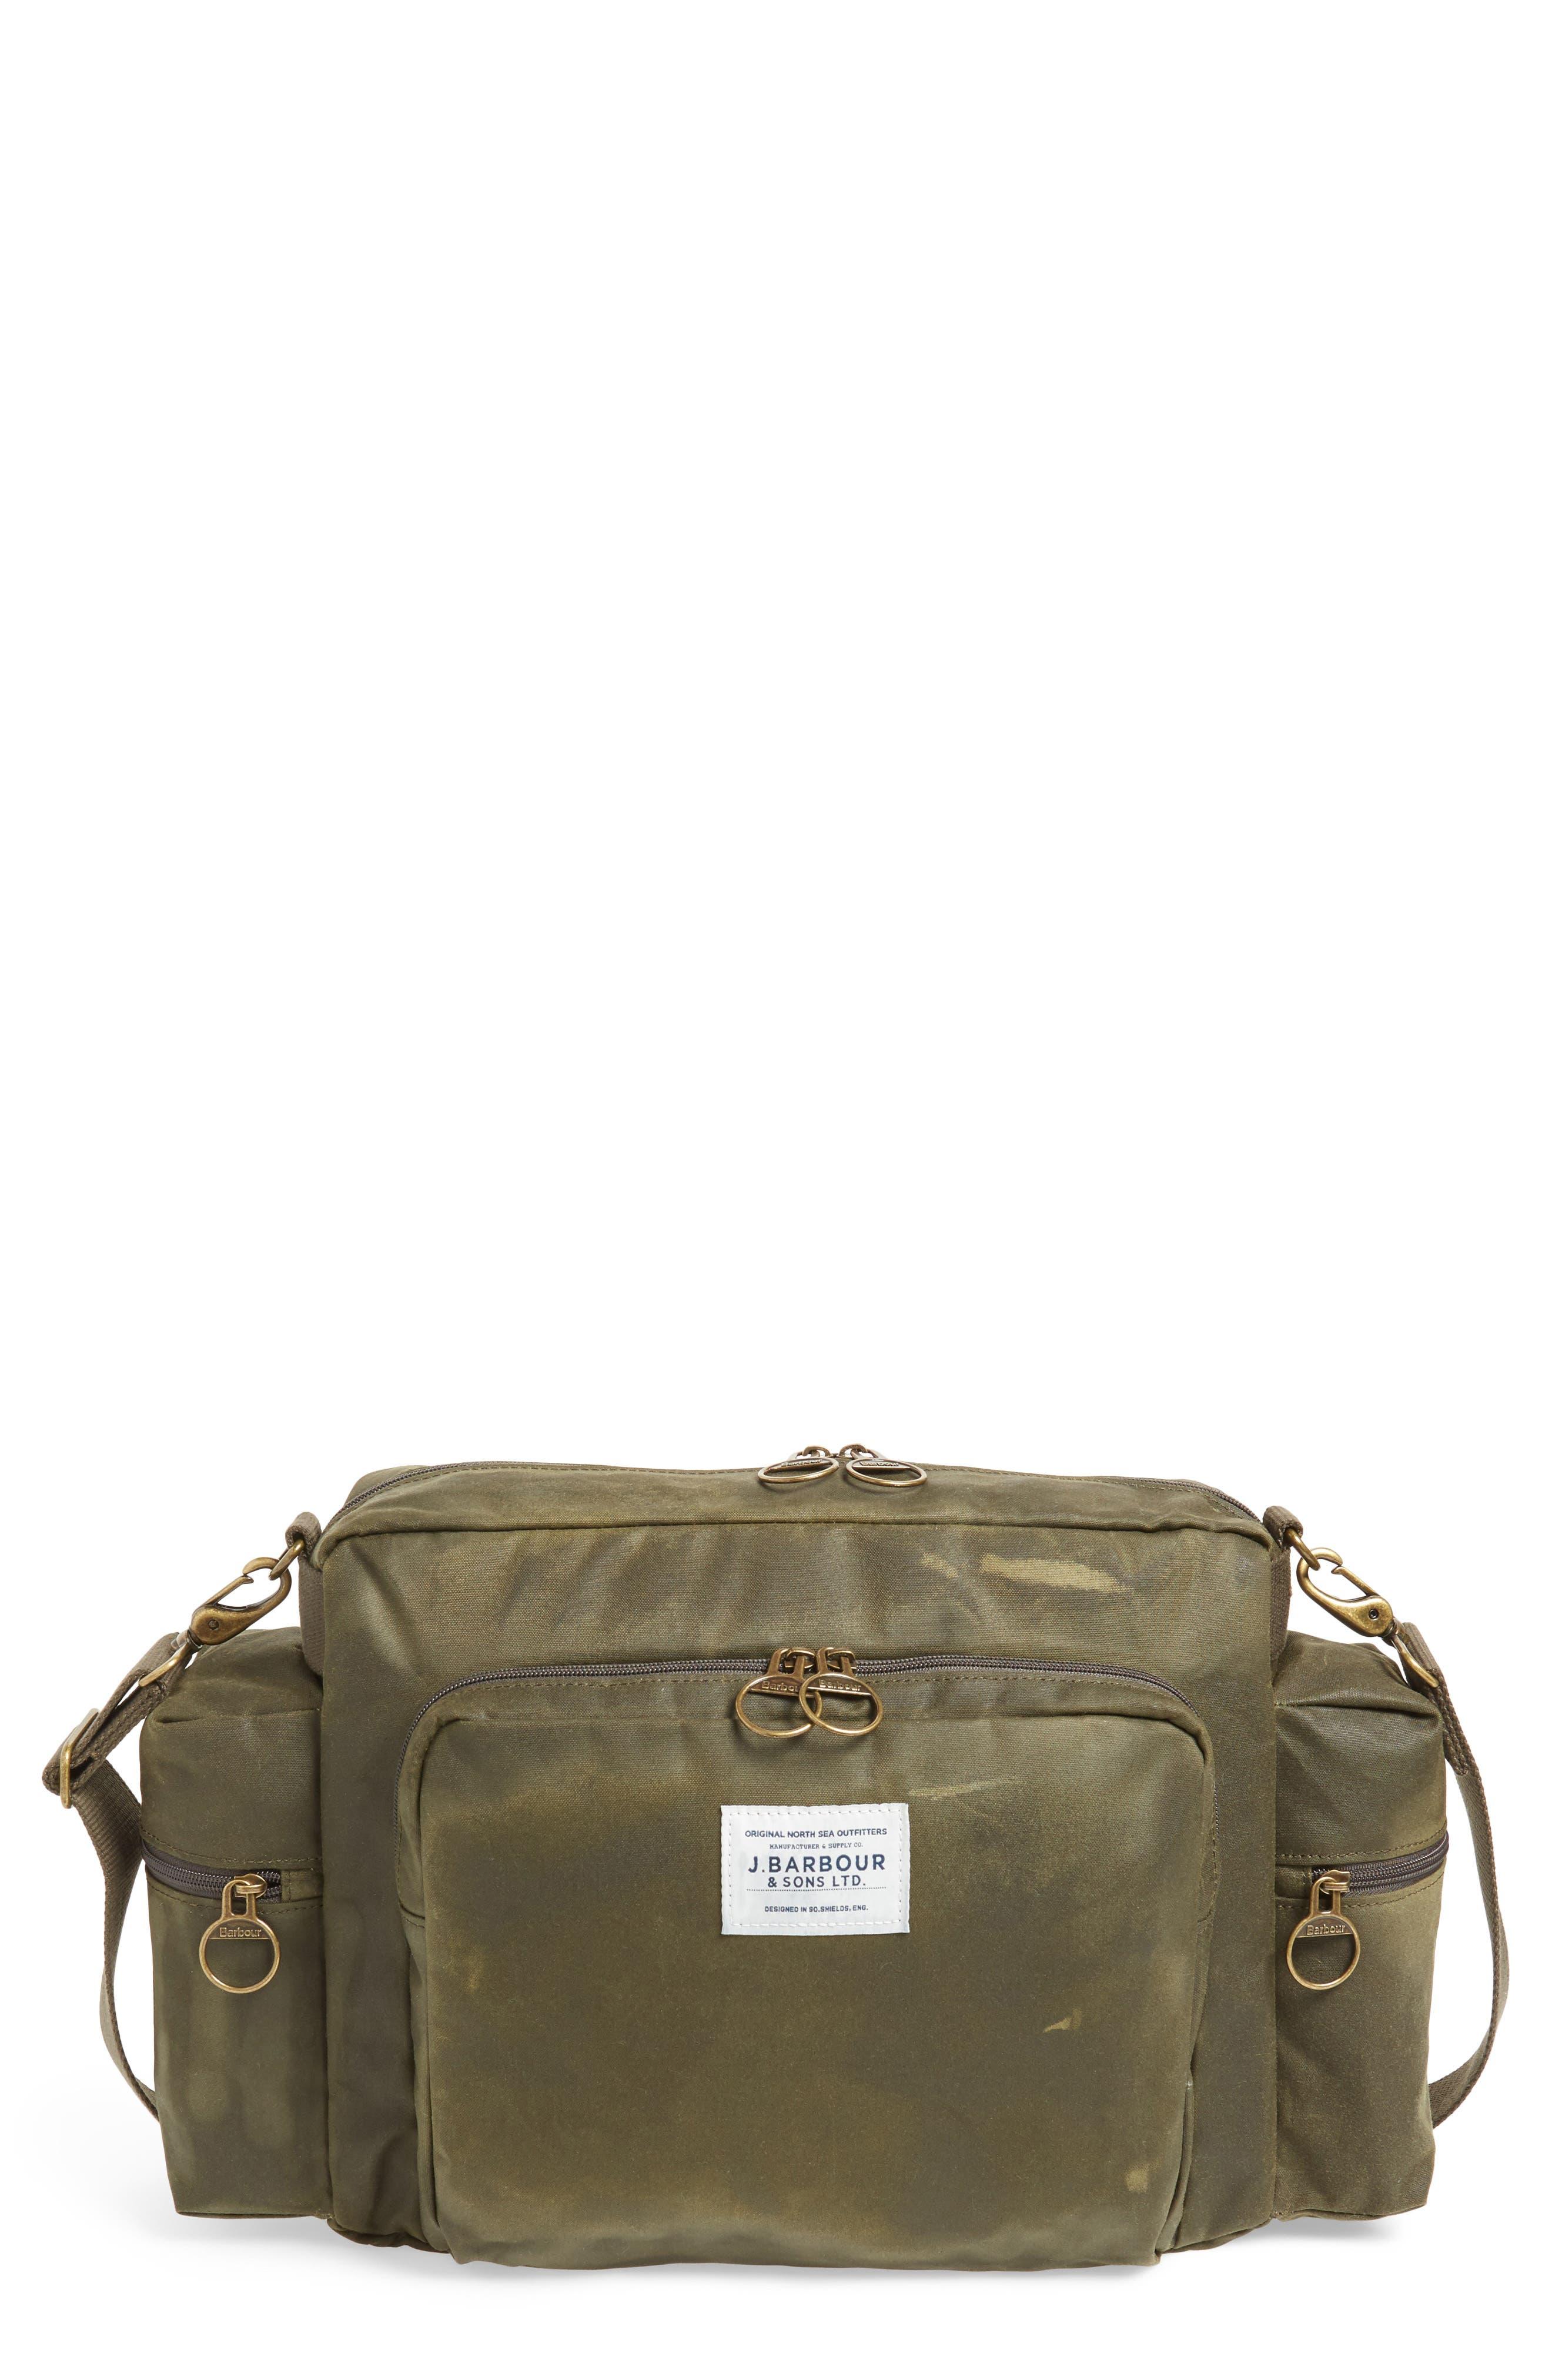 Archive Business Bag,                         Main,                         color, 300